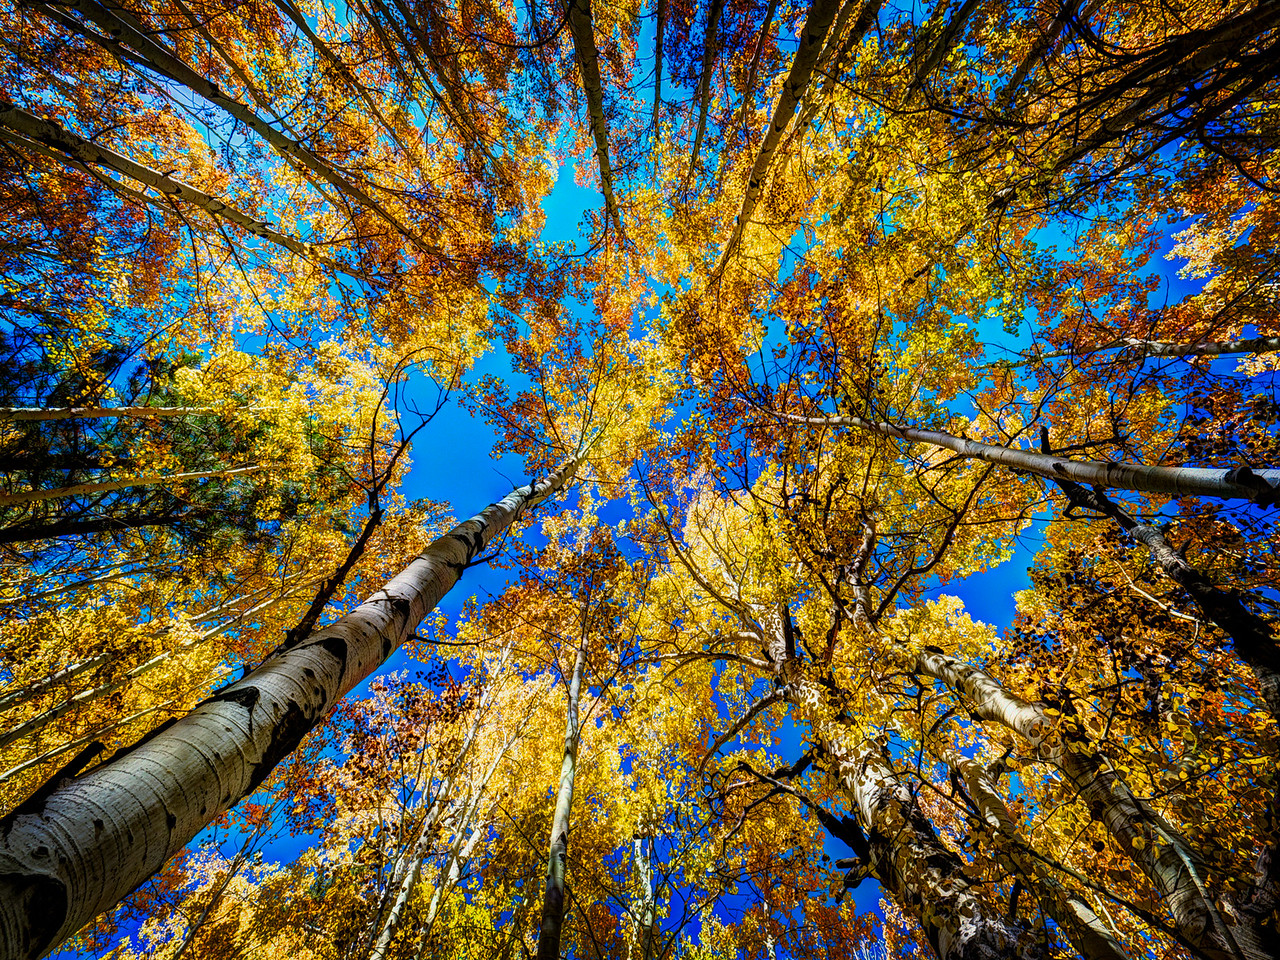 3-Intermediate-Open-DNP-Hiroshi_Kamaya-Aspen_trees